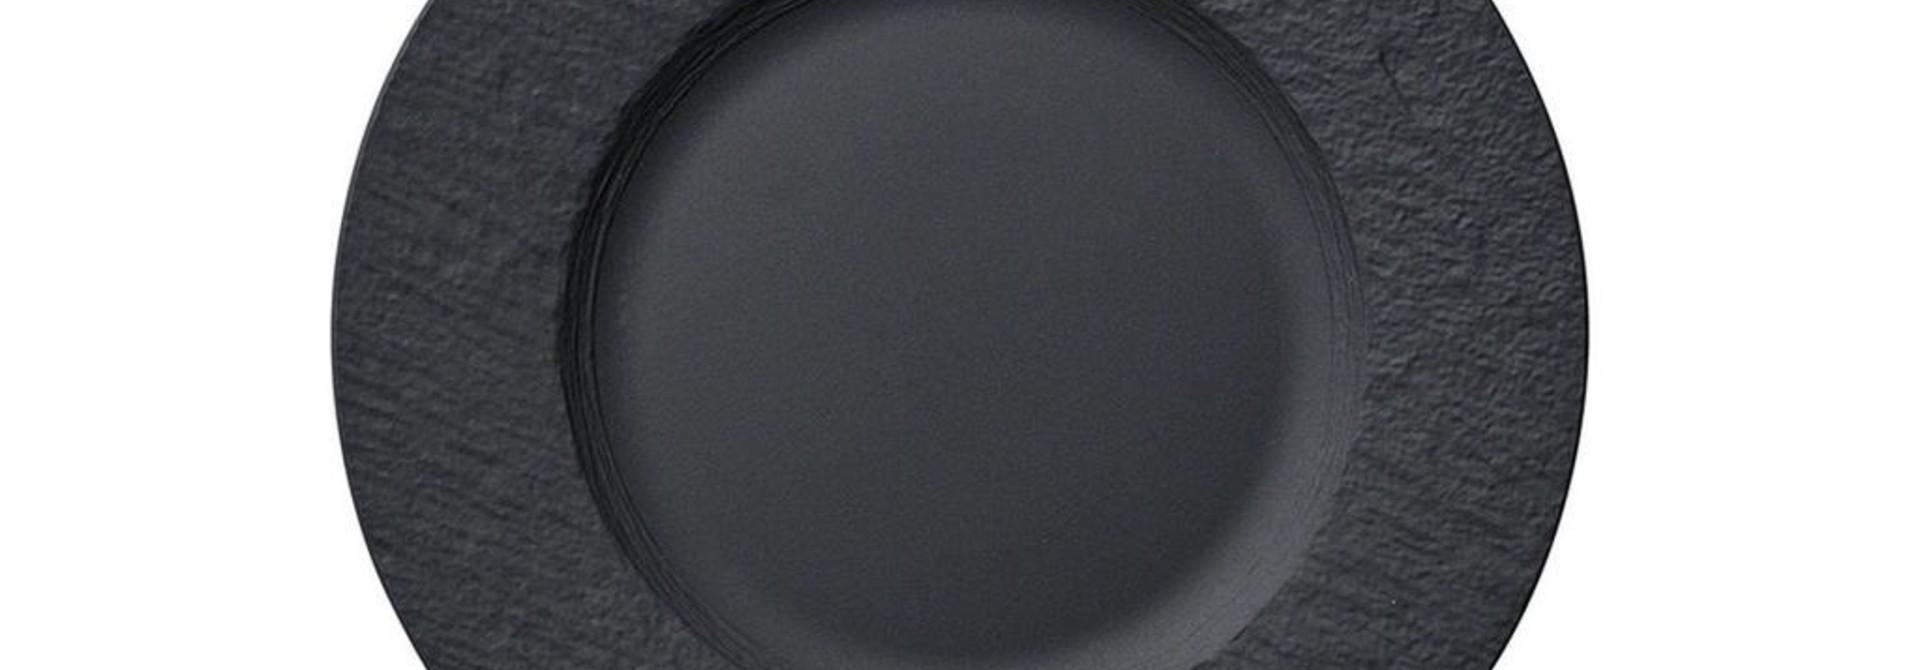 VILLEROY & BOCH - Manufacture Rock Dessert Plate 22cm